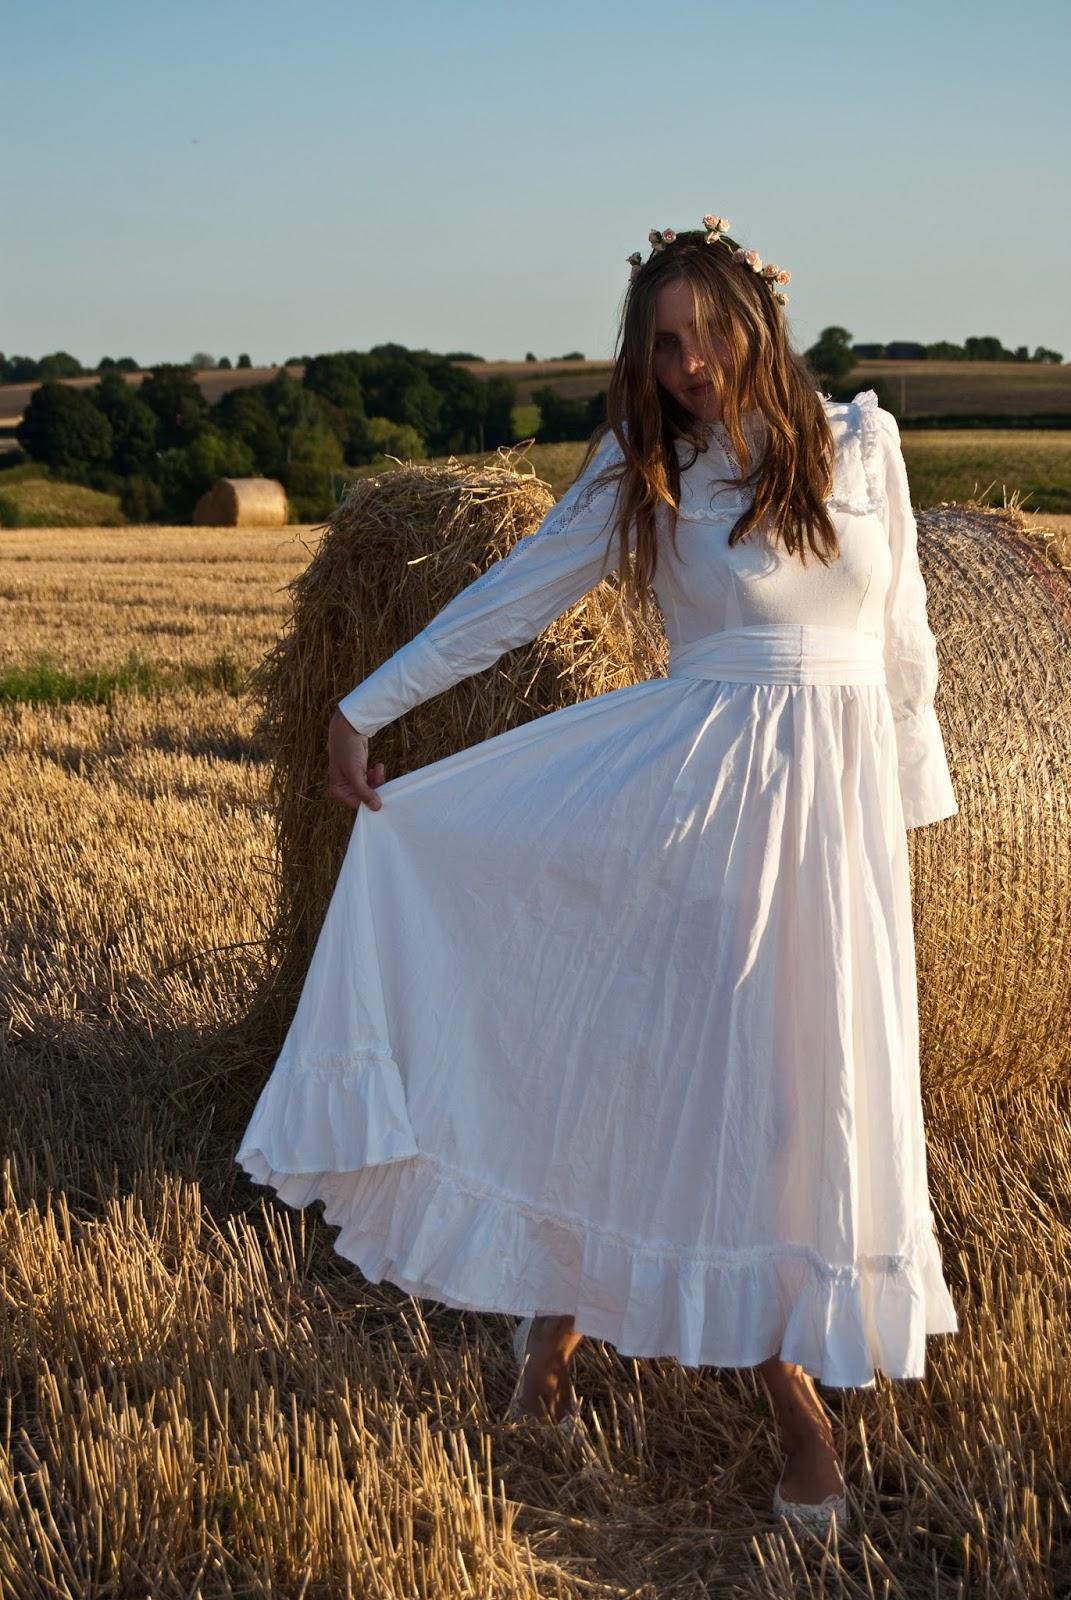 vintage laura ashley wedding prairie laura ashley wedding dresses Vintage Laura Ashley wedding prairie dress from the s